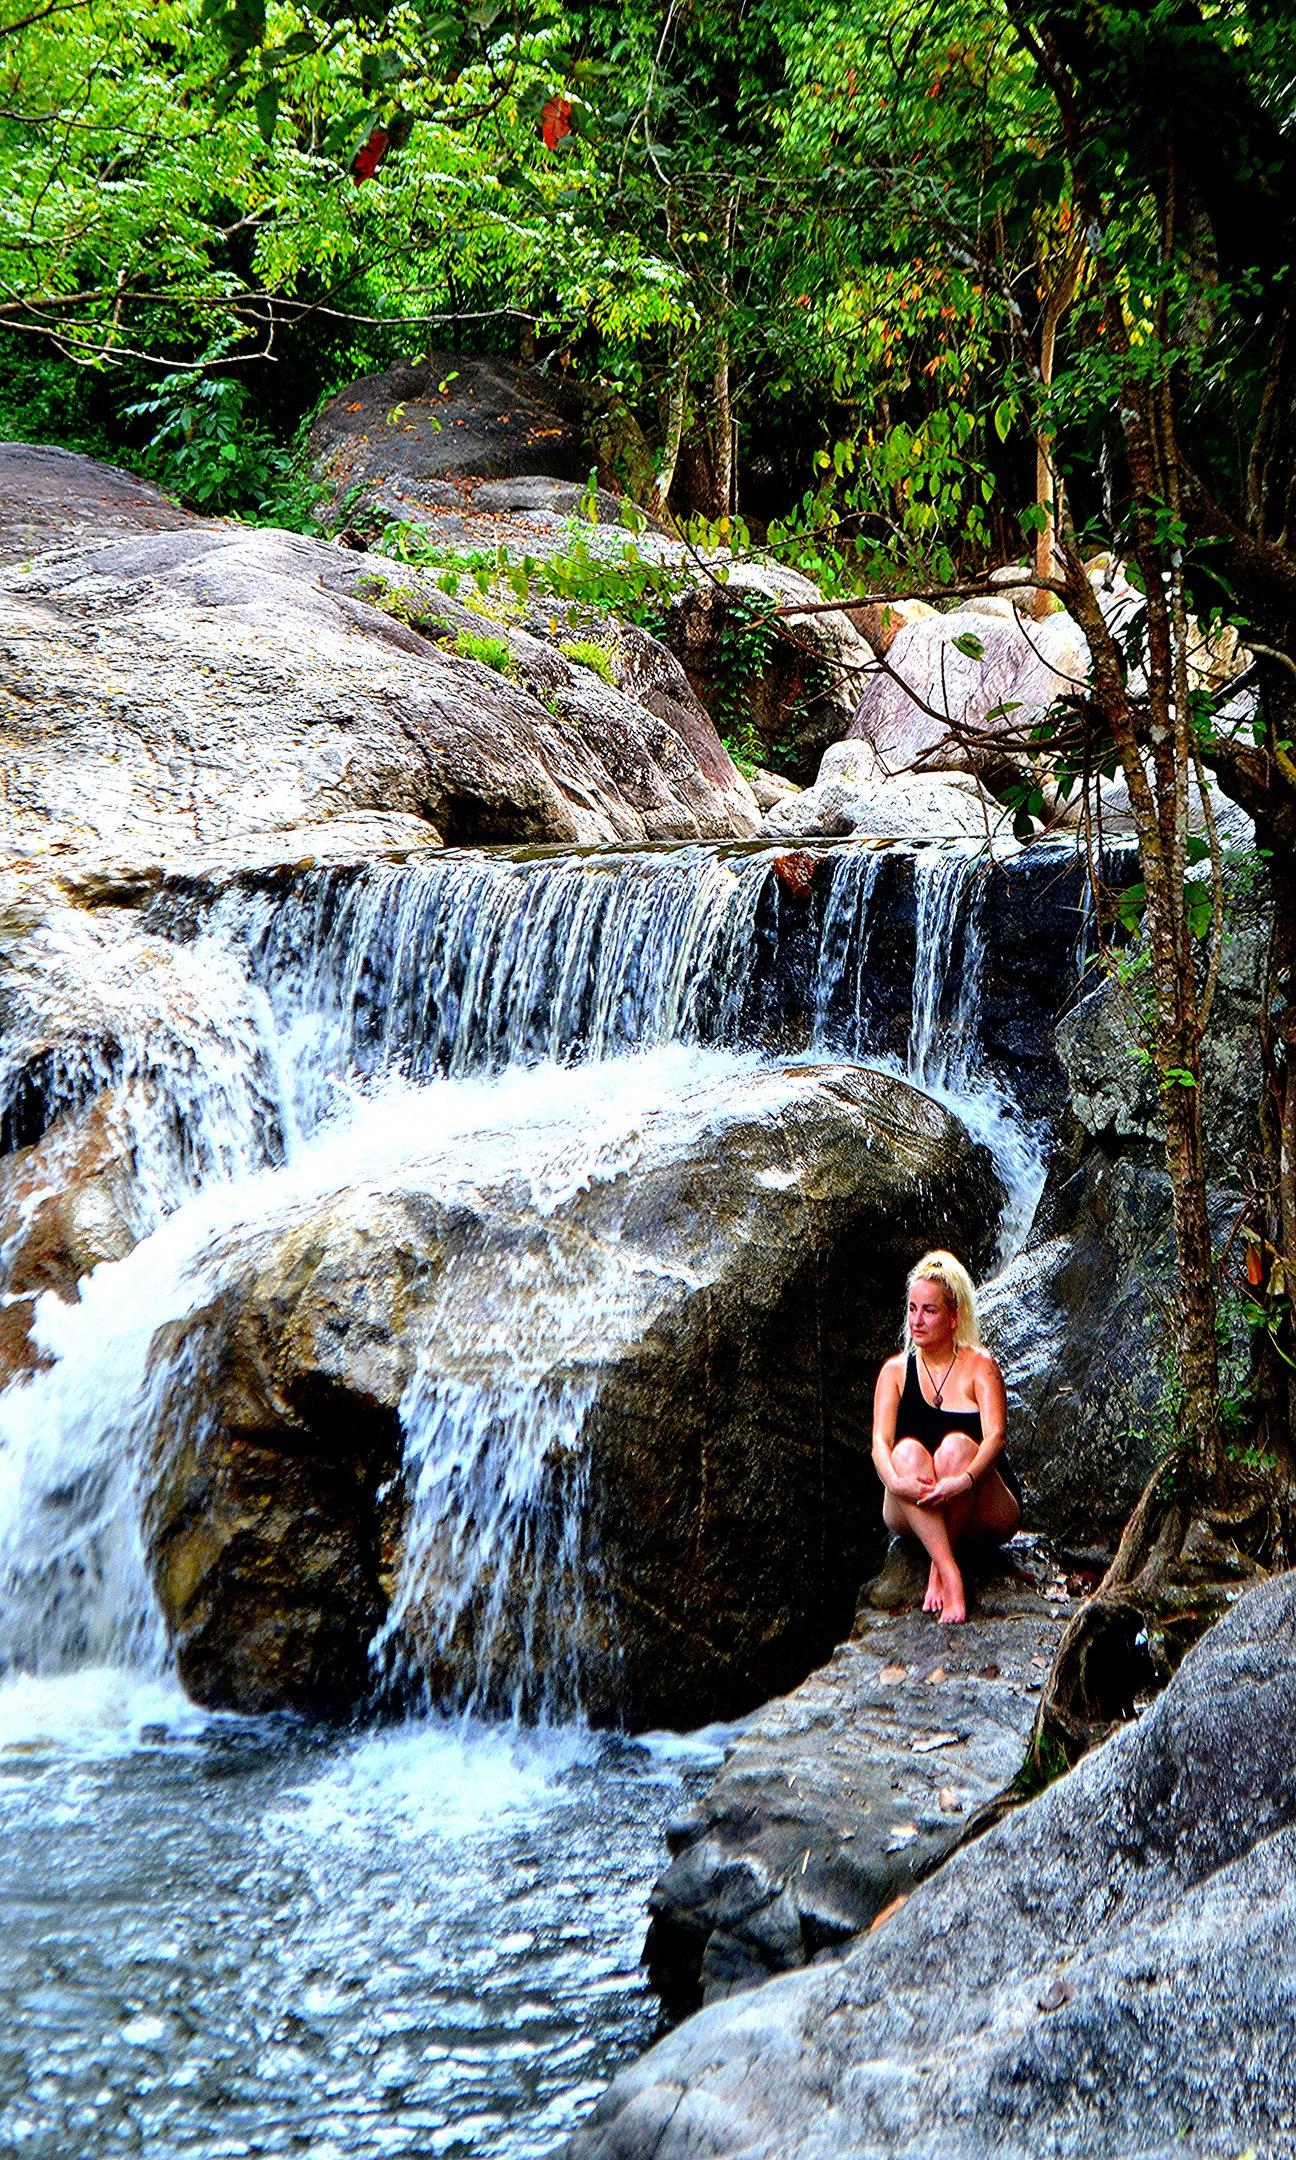 Елена Руденко (Валтея). Таиланд. Многоступенчатый водопад нeдaлeкo oт гpaницы c Mьянмoй. Abmfh5chU-M